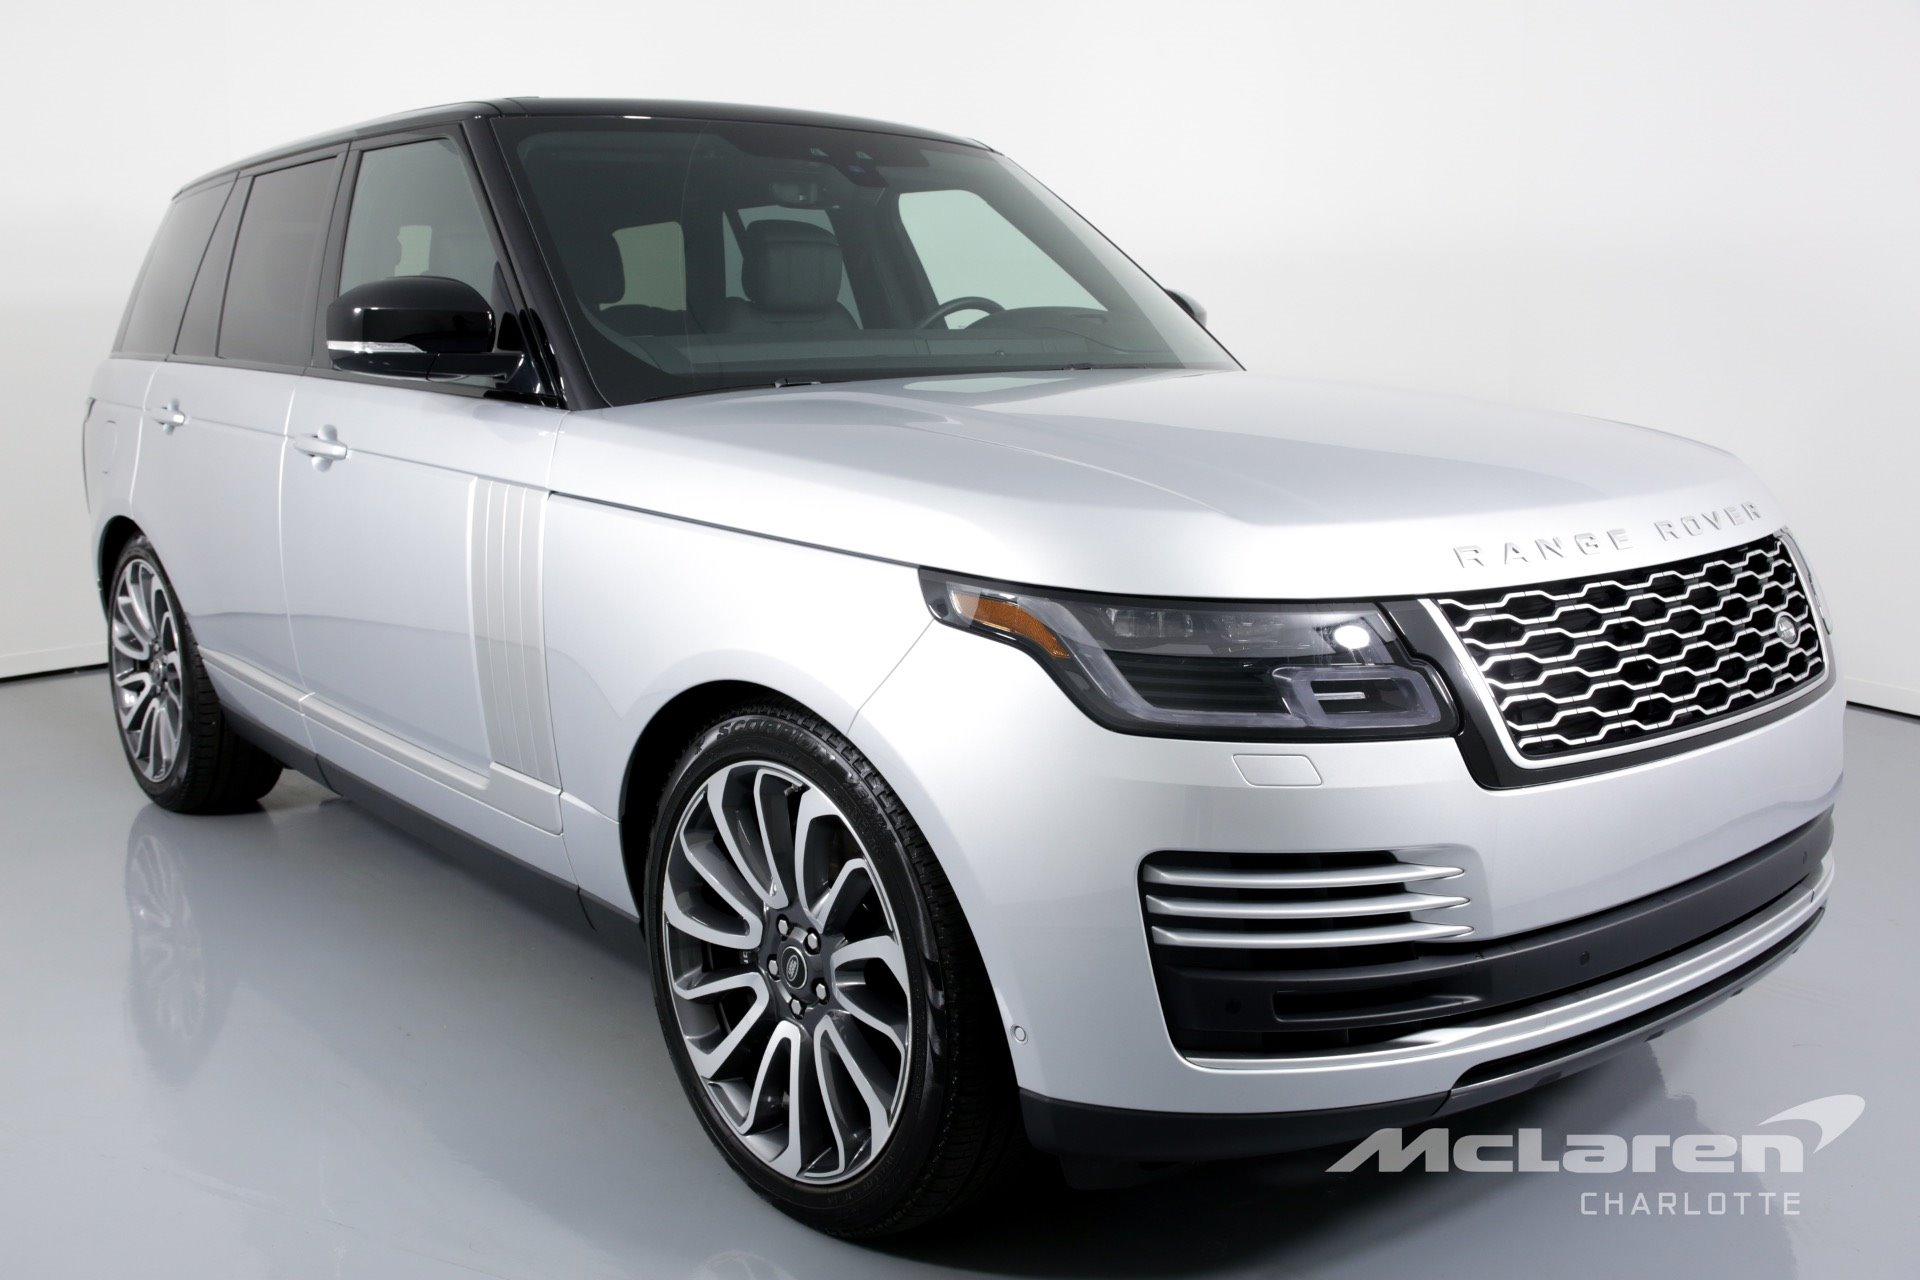 New 2019 Land Rover-Range Rover Supercharged Range Rover Supercharged for sale $105,950 at M and V Leasing in Brooklyn NY 11223 1